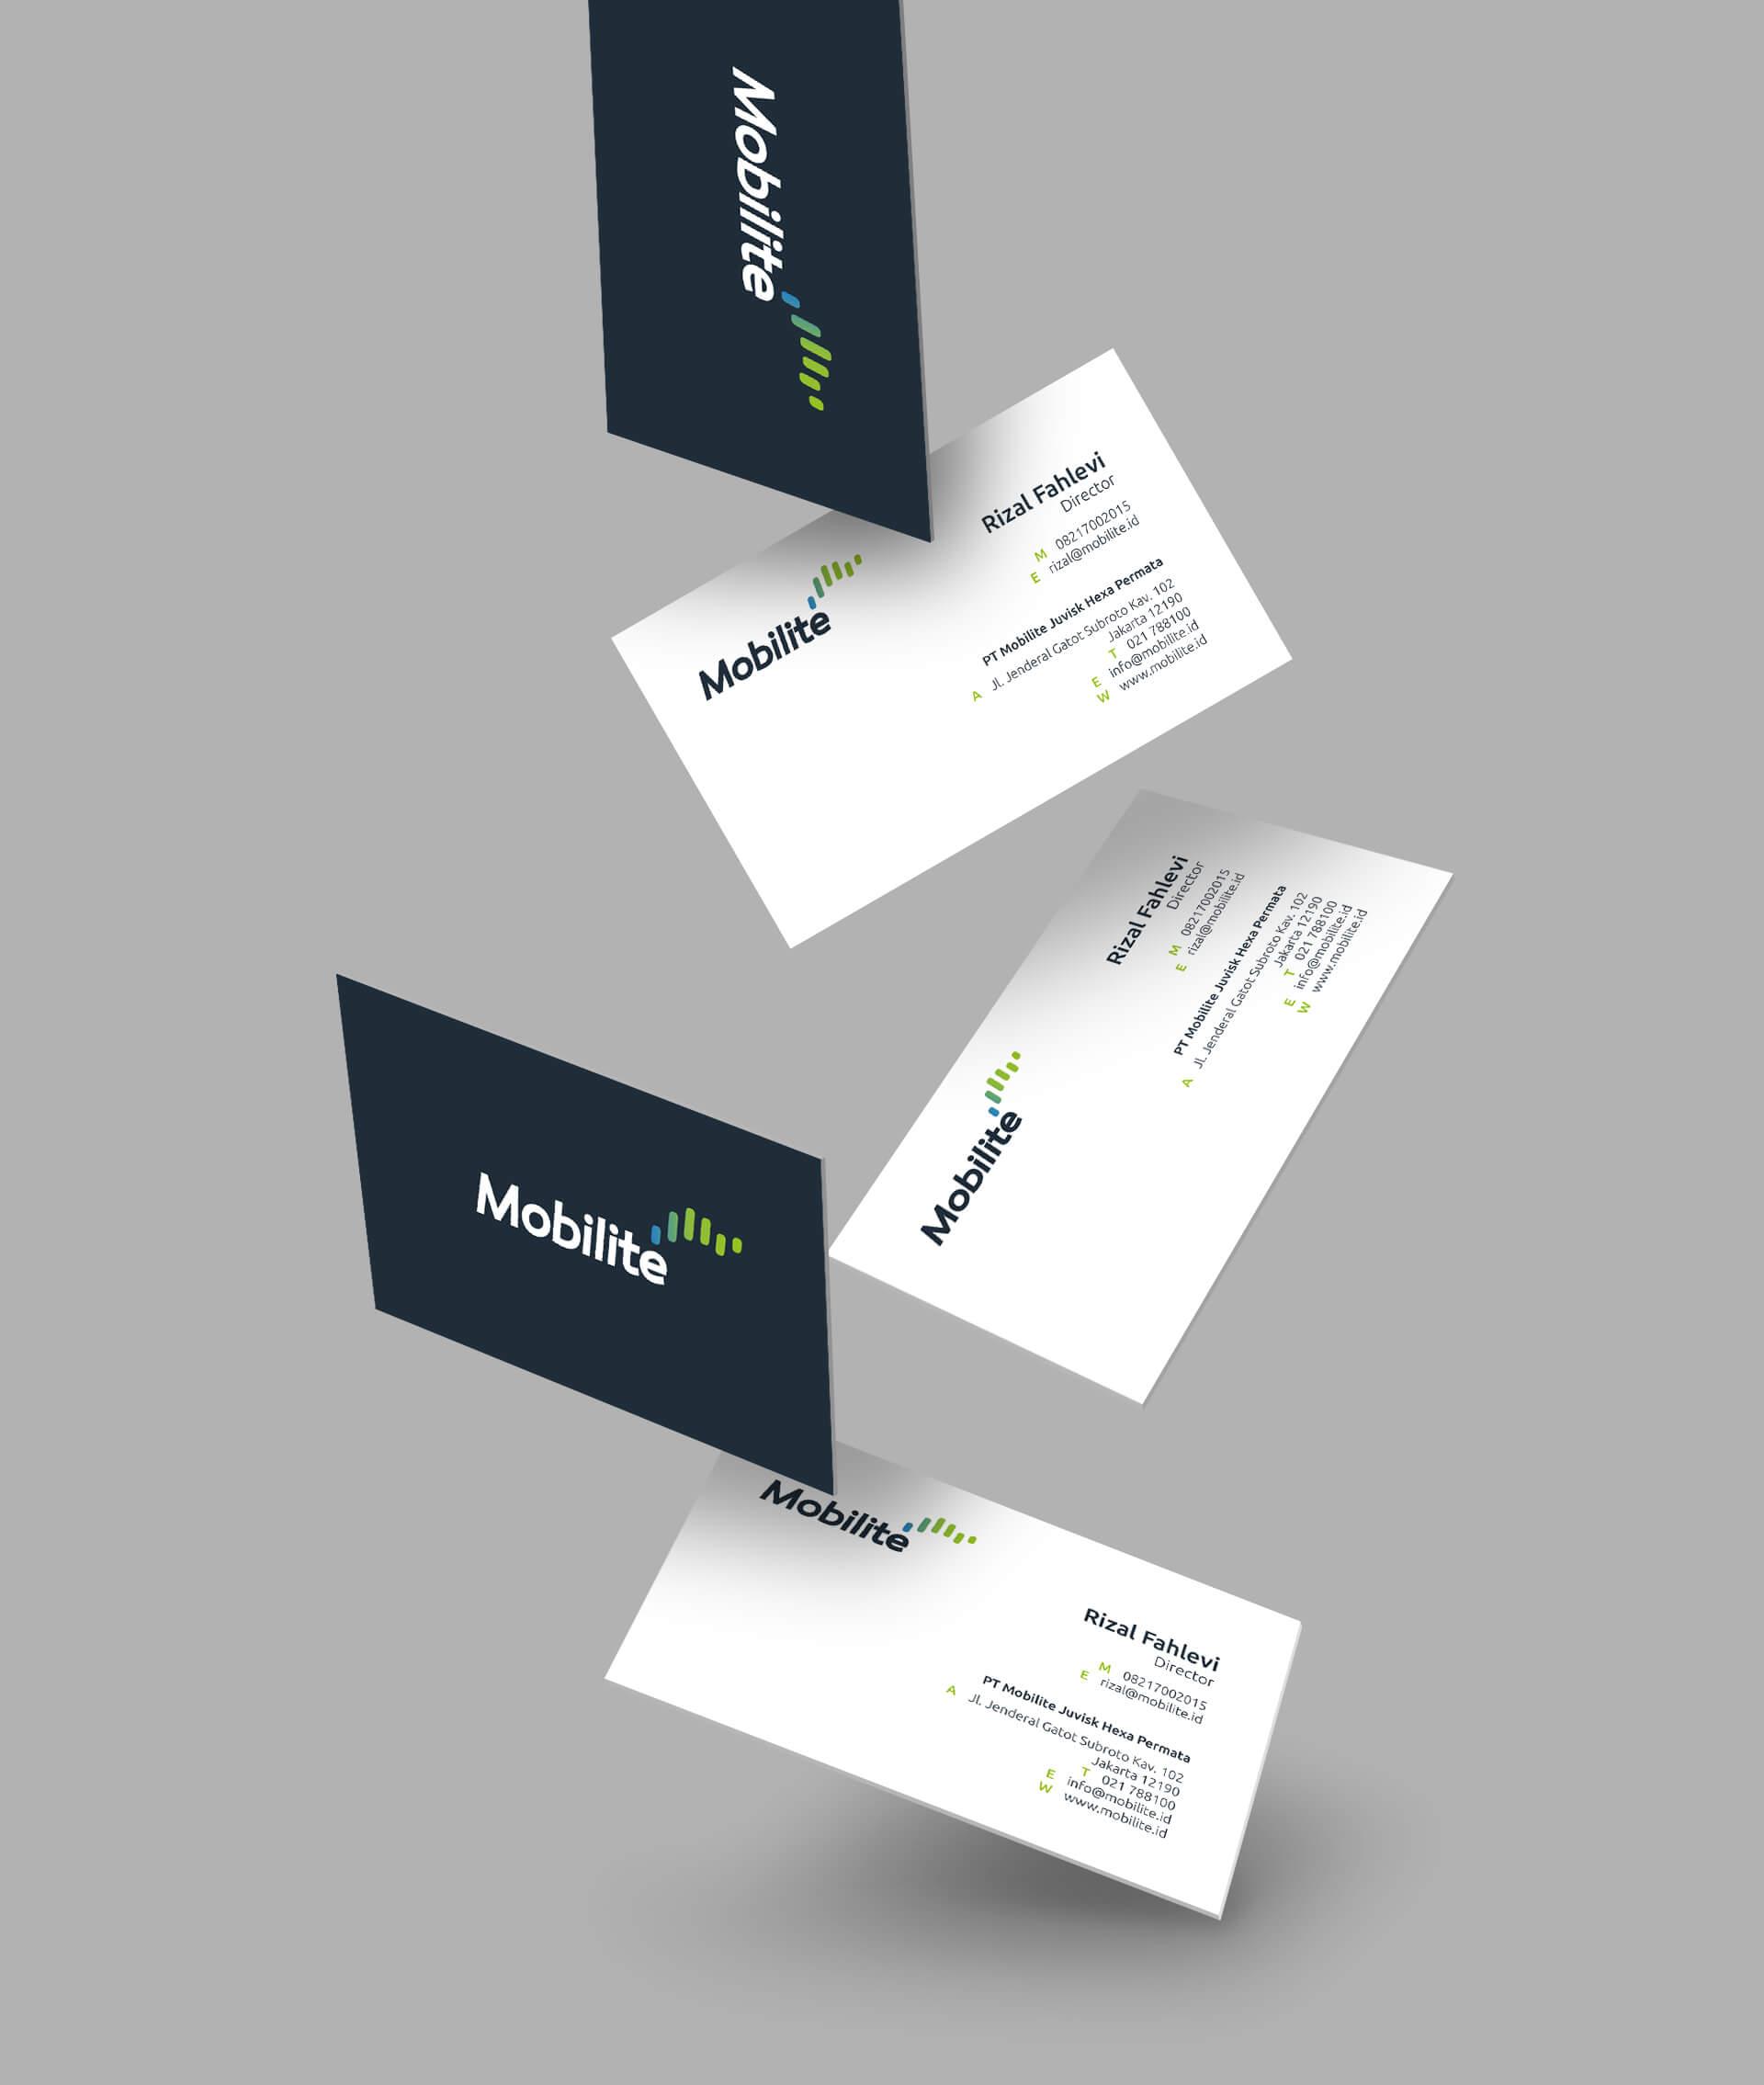 mobilite-name-card